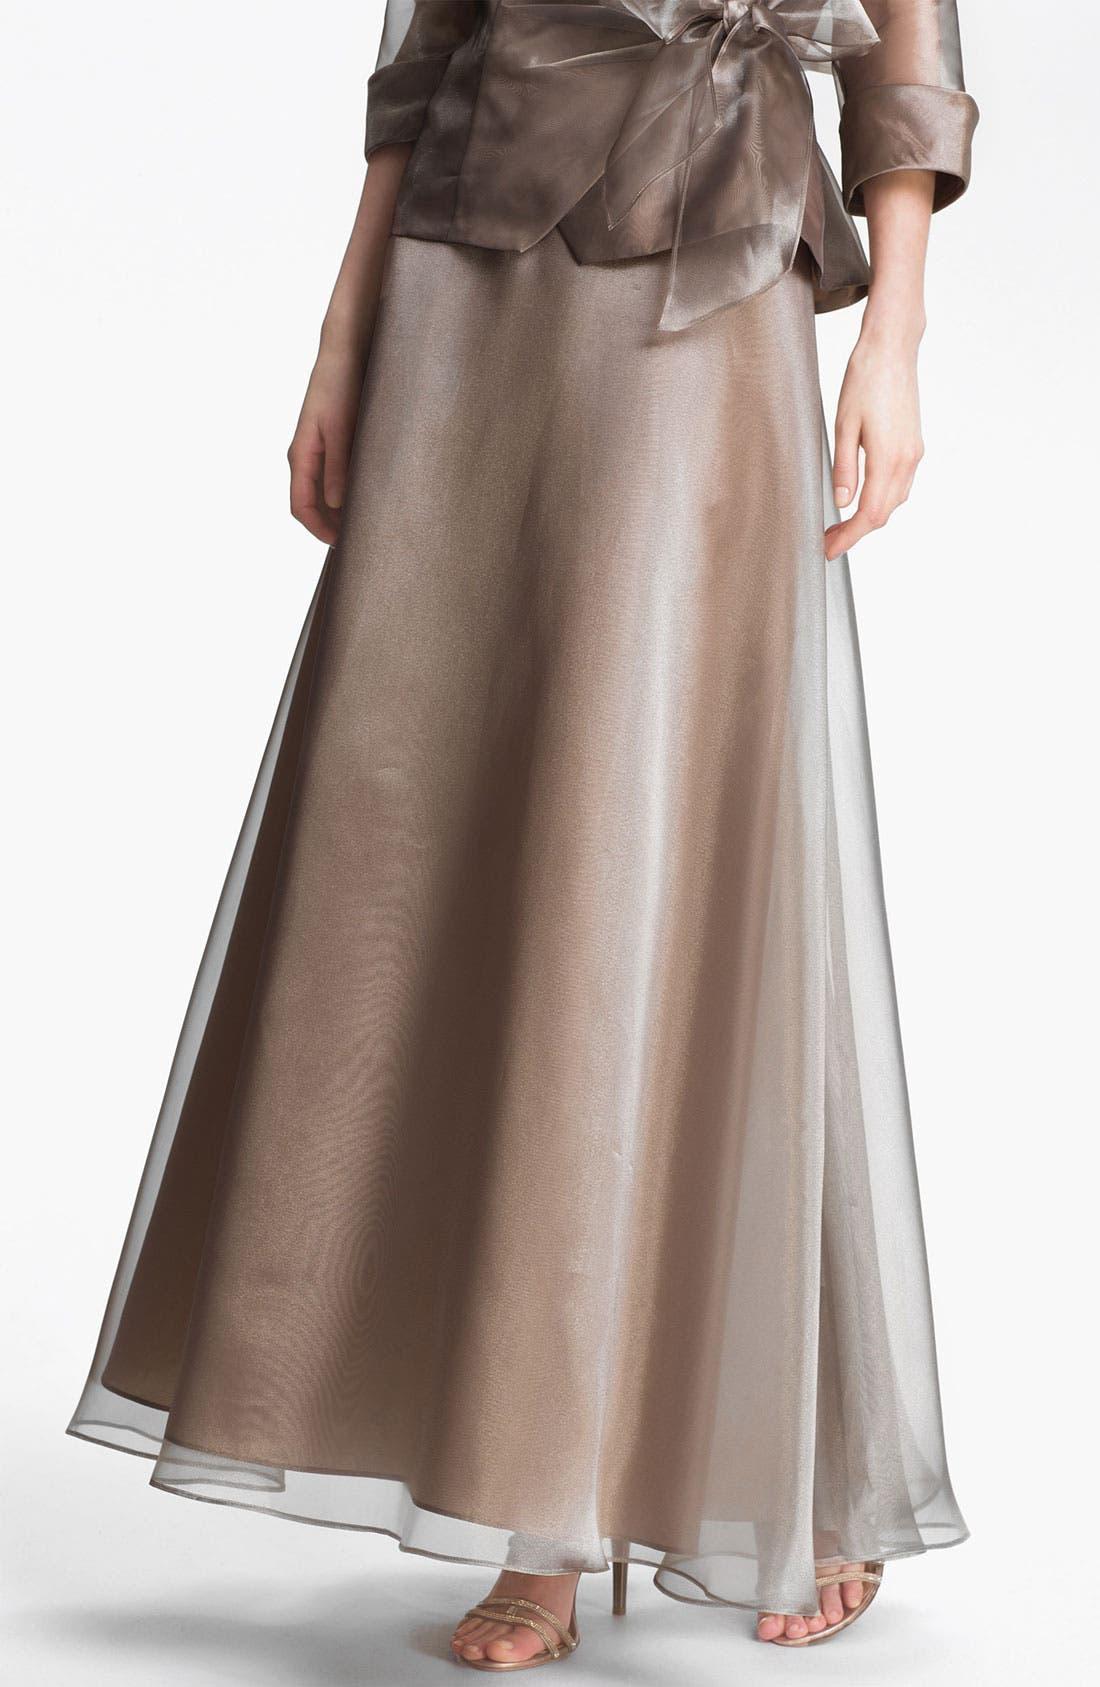 Alternate Image 1 Selected - Alex Evenings Metallic Organza Flare Skirt